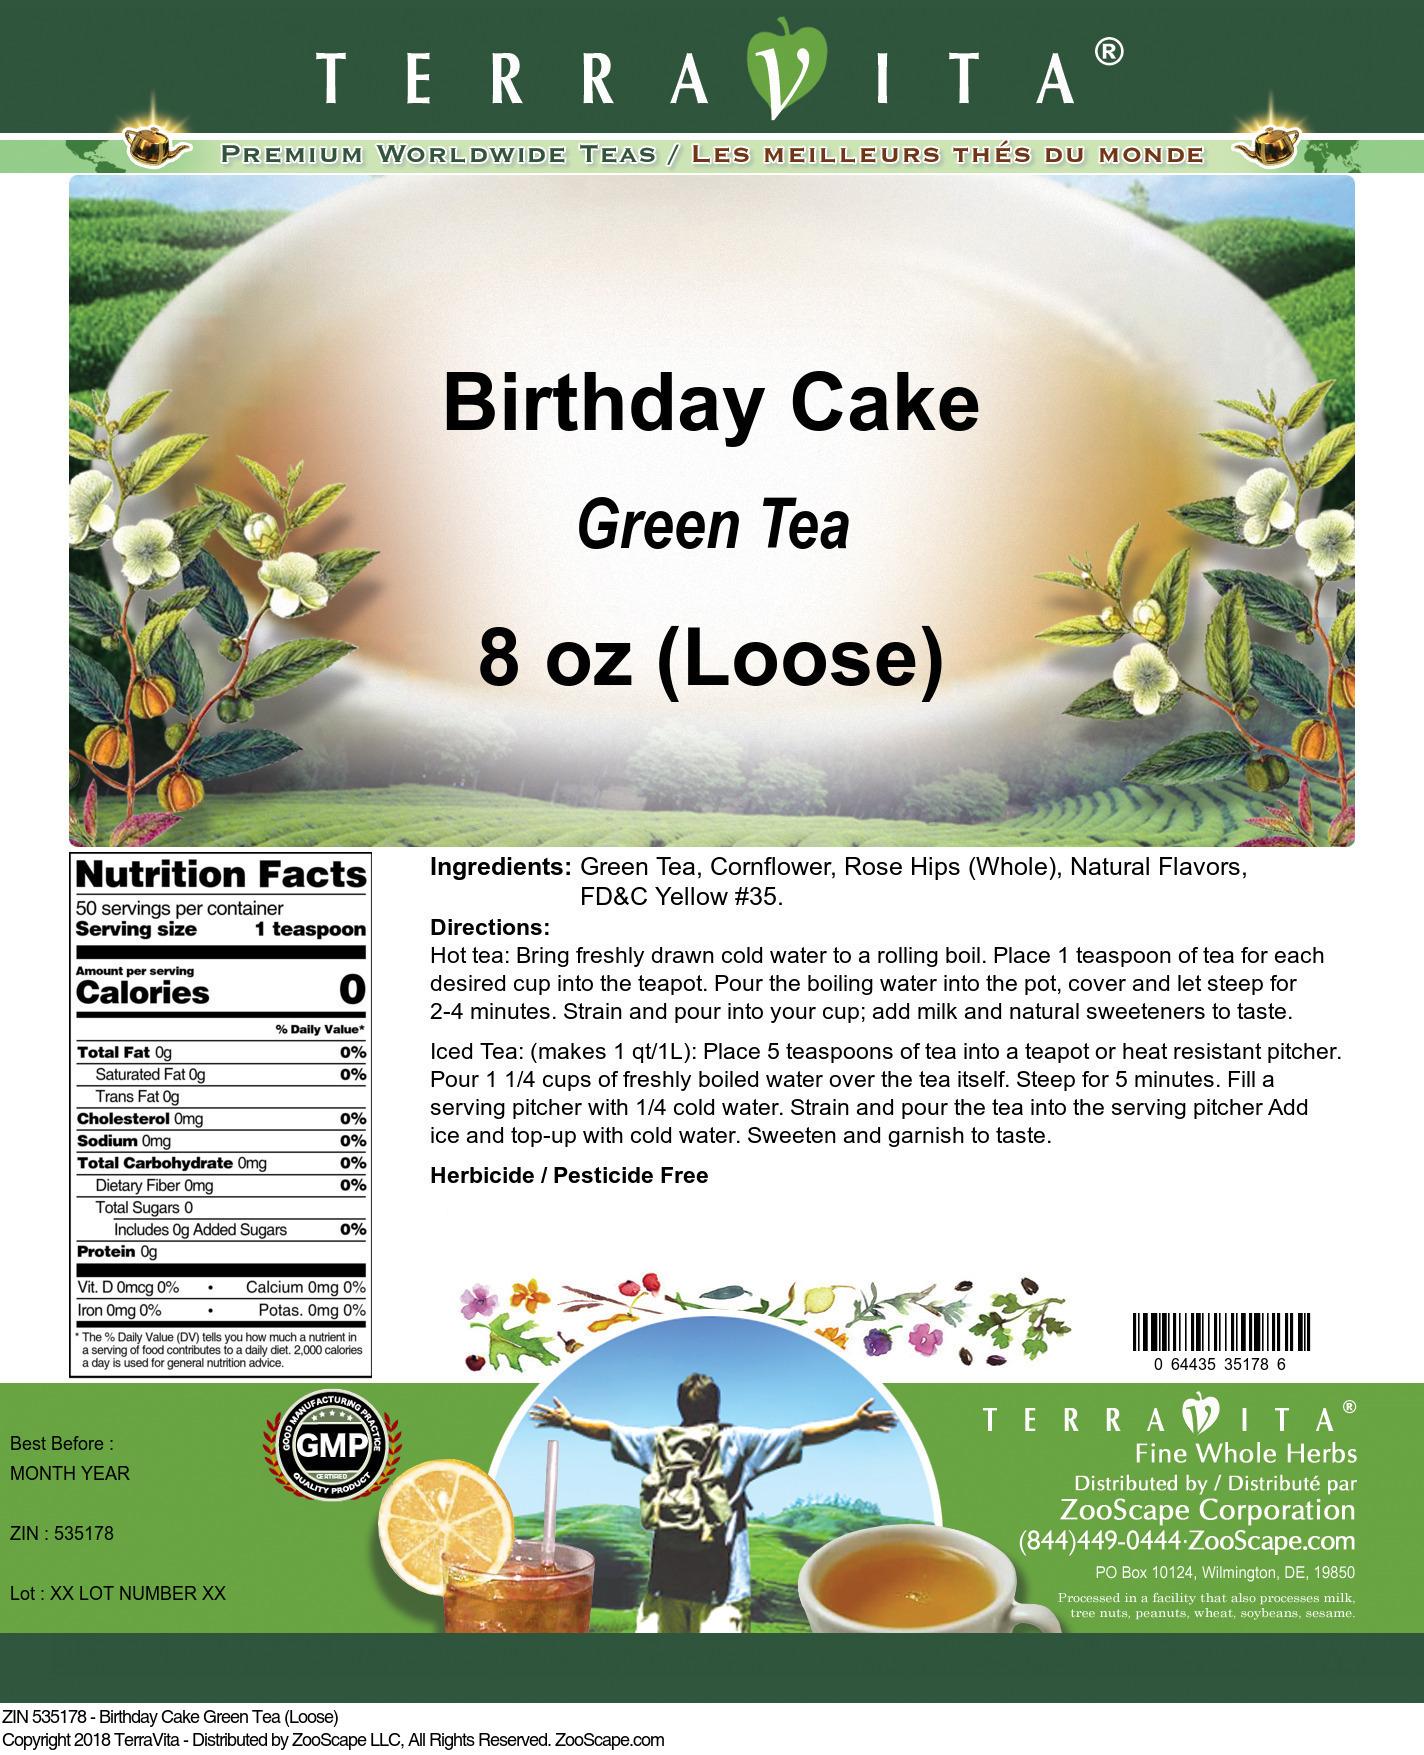 Birthday Cake Green Tea (Loose)